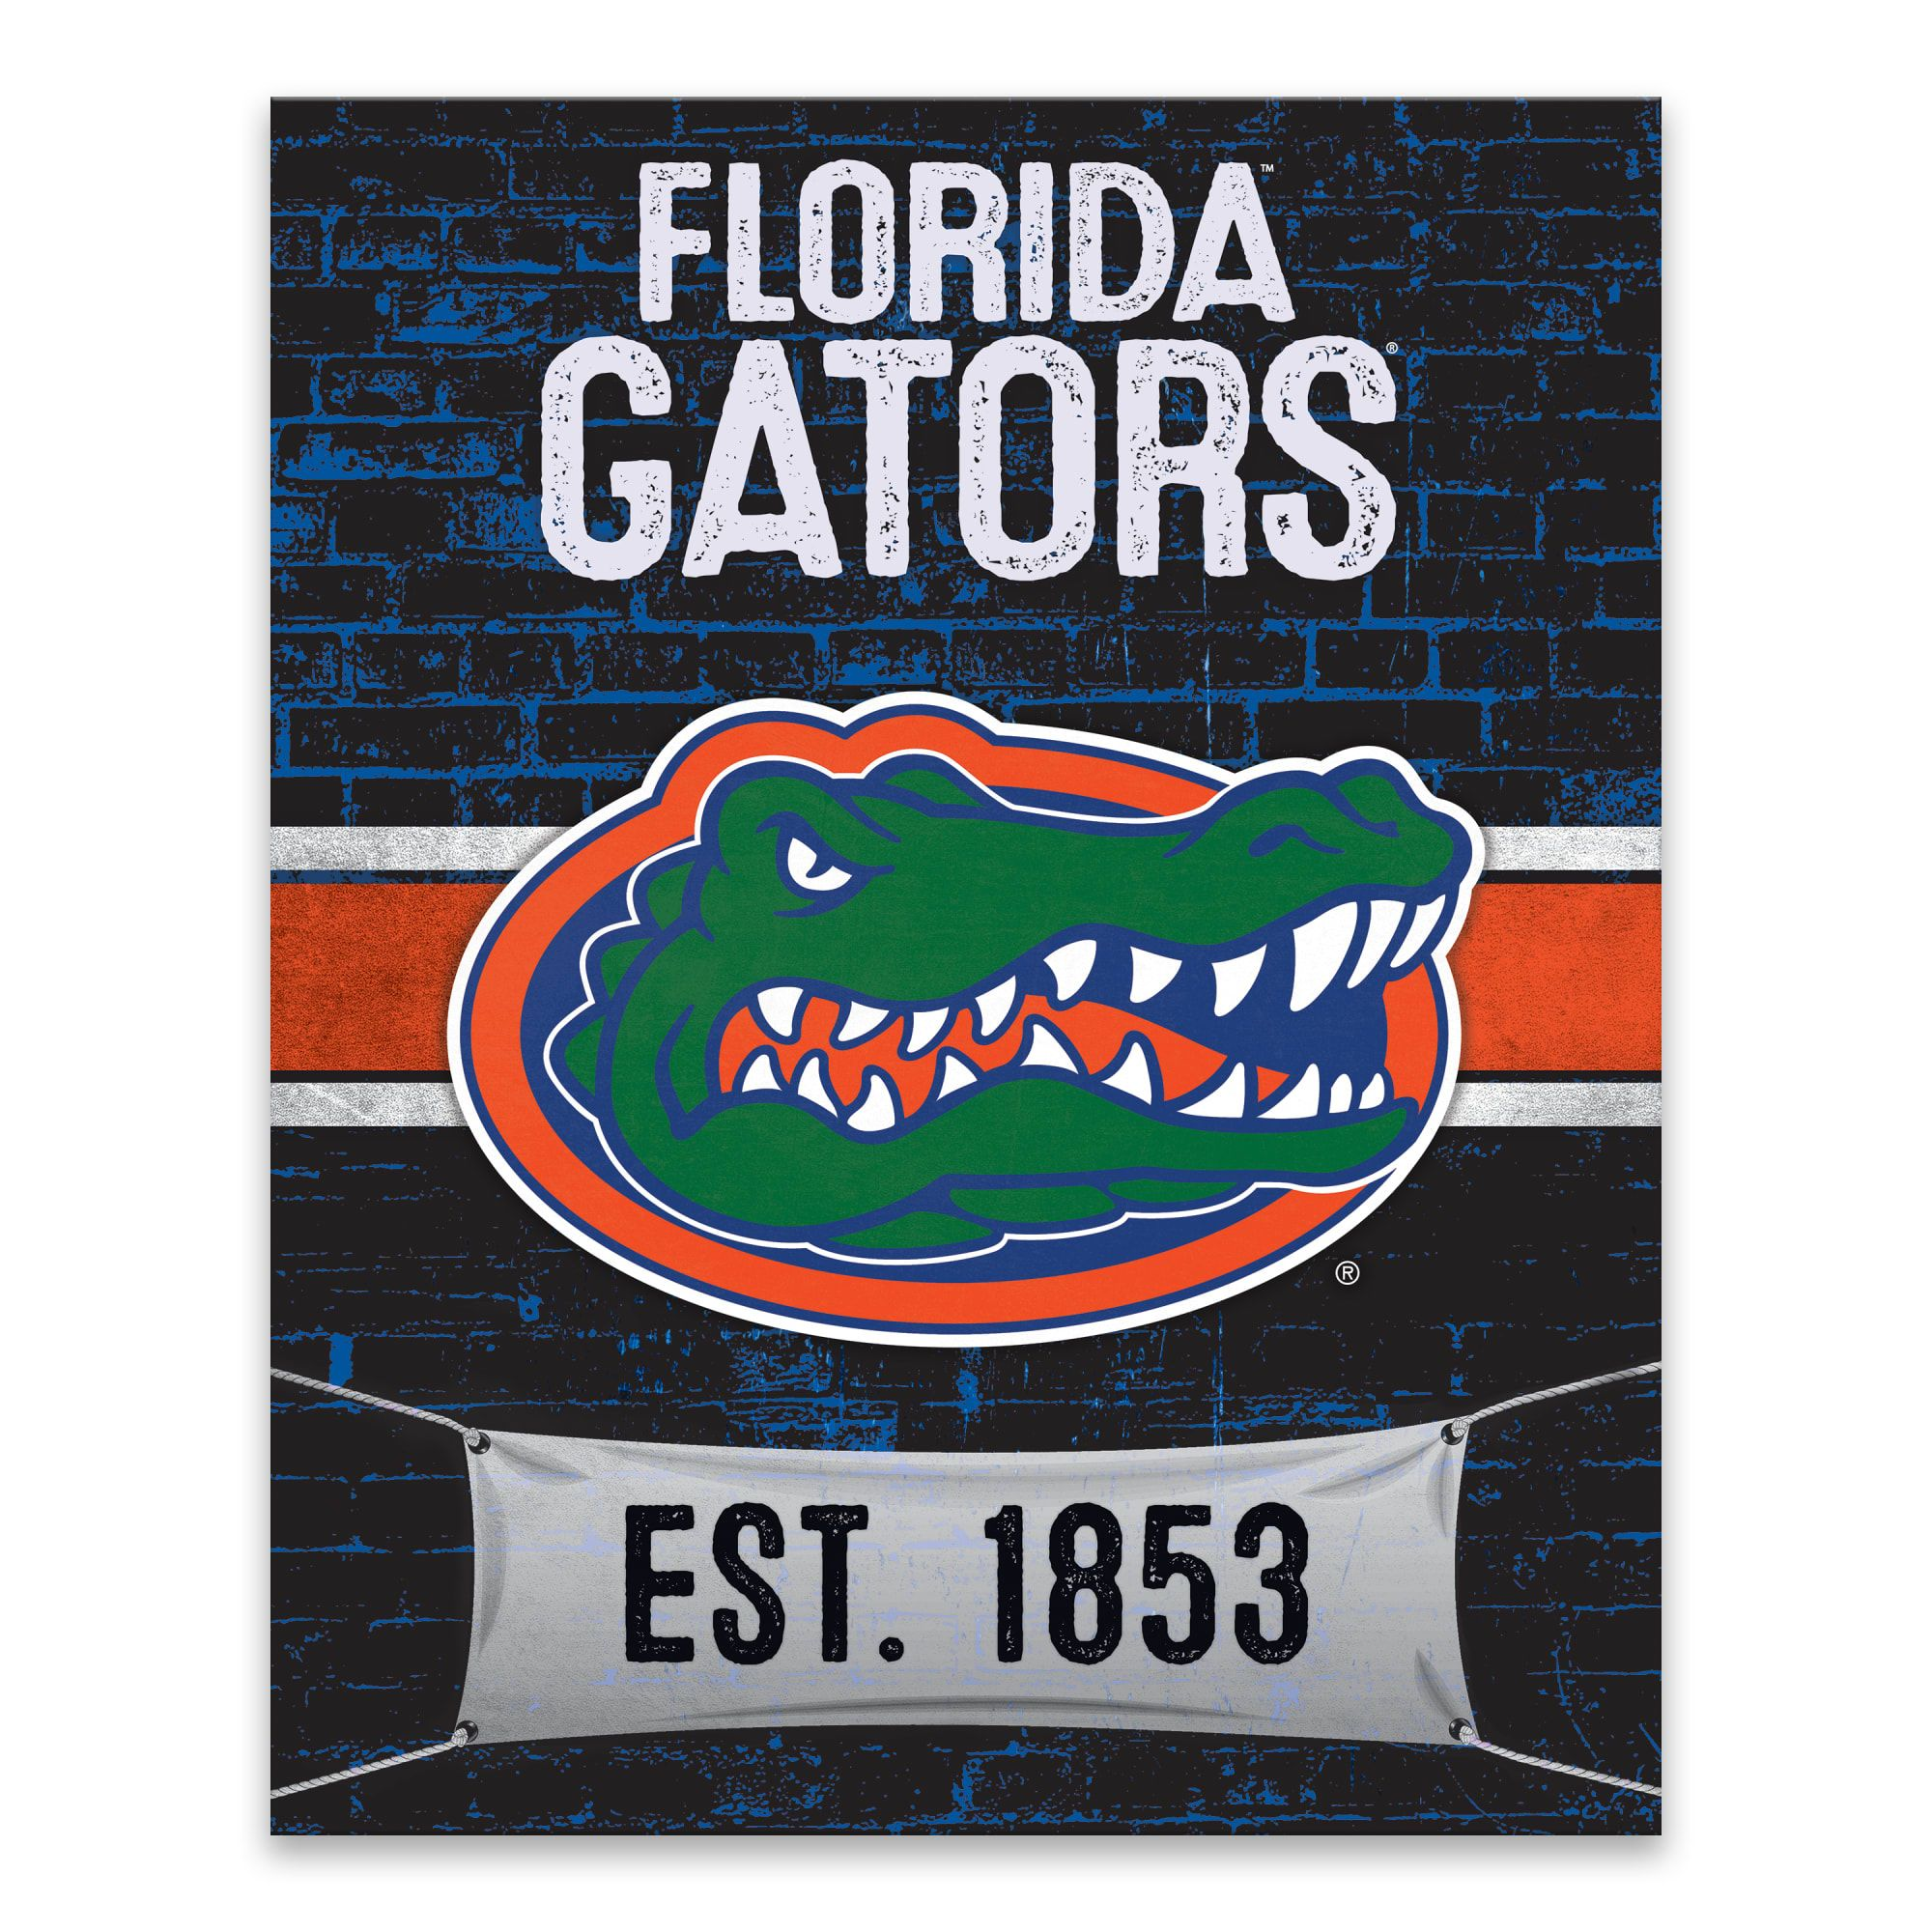 Florida Gators Brickyard Design Officially Licensed Printed Canvas Art Canvas Wall Art Florida Gators Wall Art